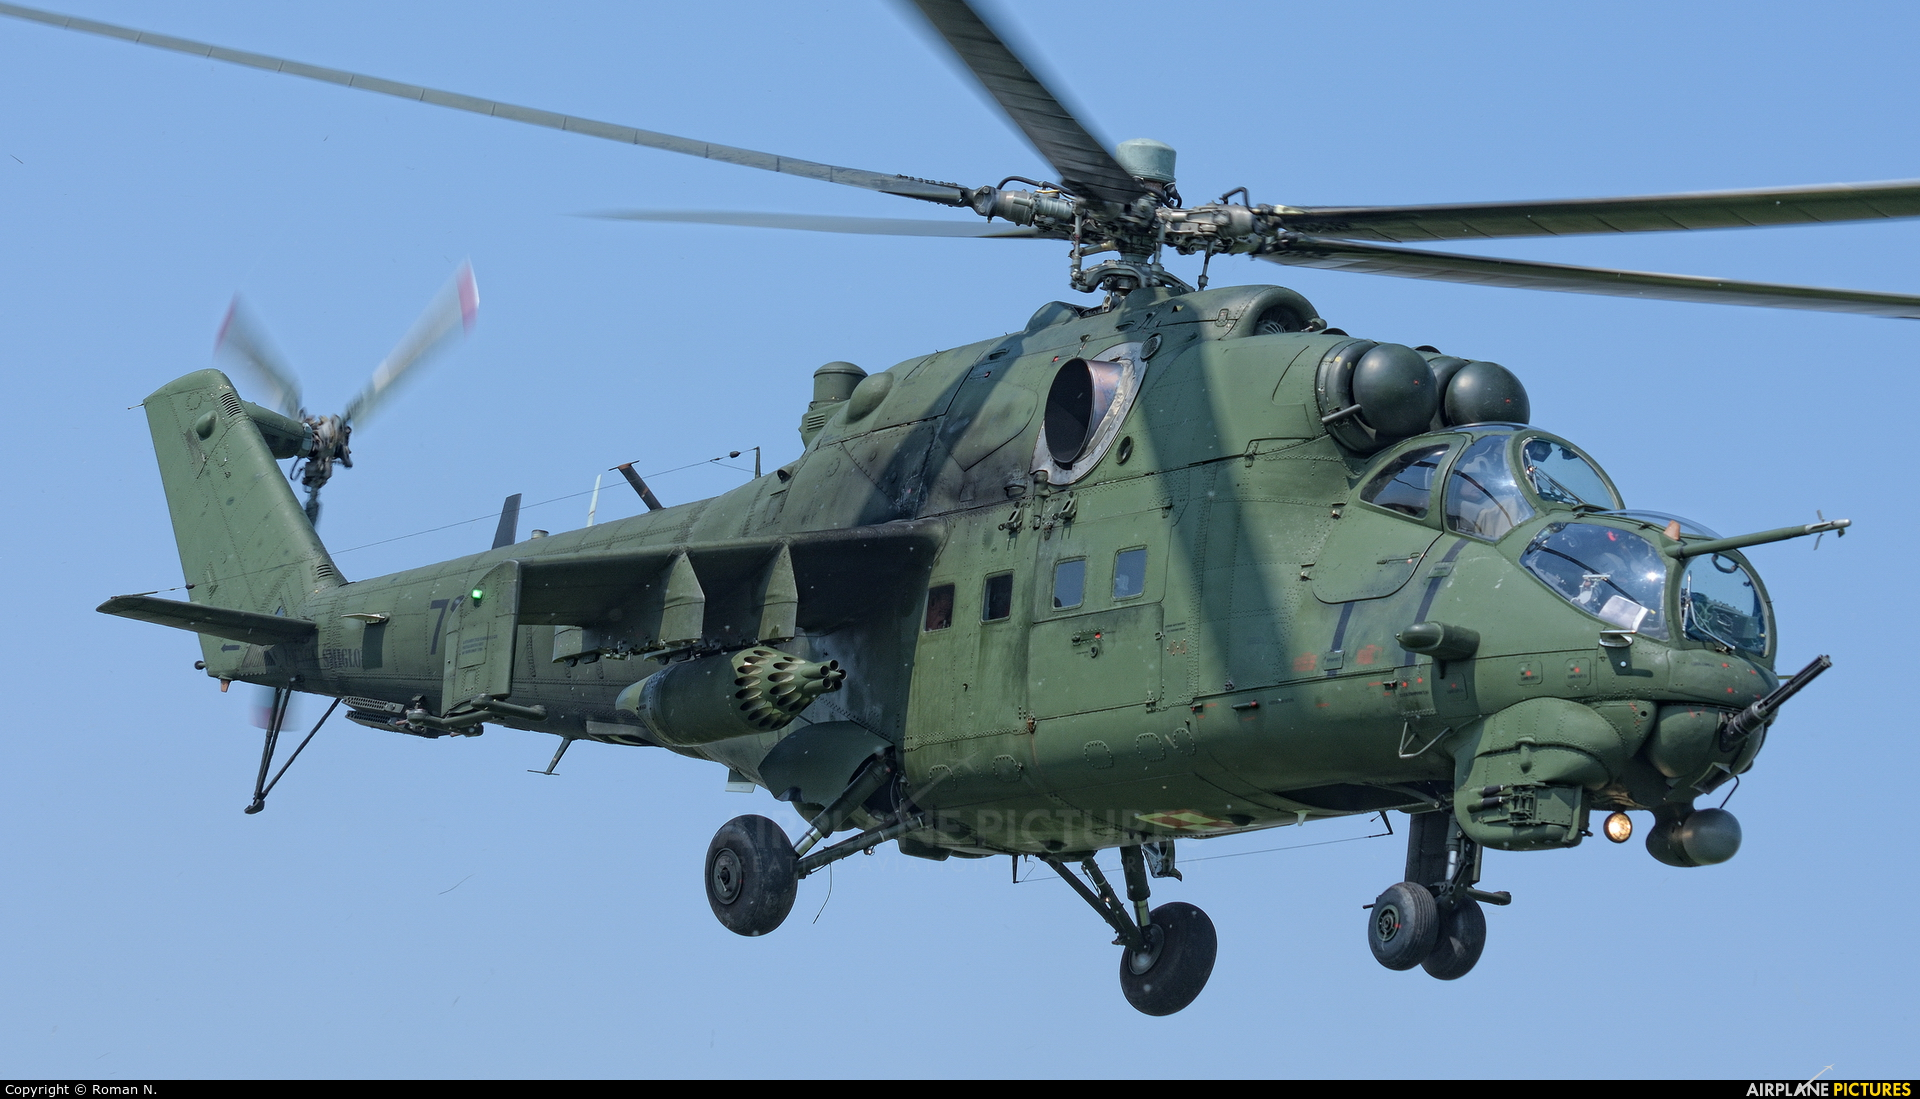 Poland - Army 728 aircraft at Inowrocław